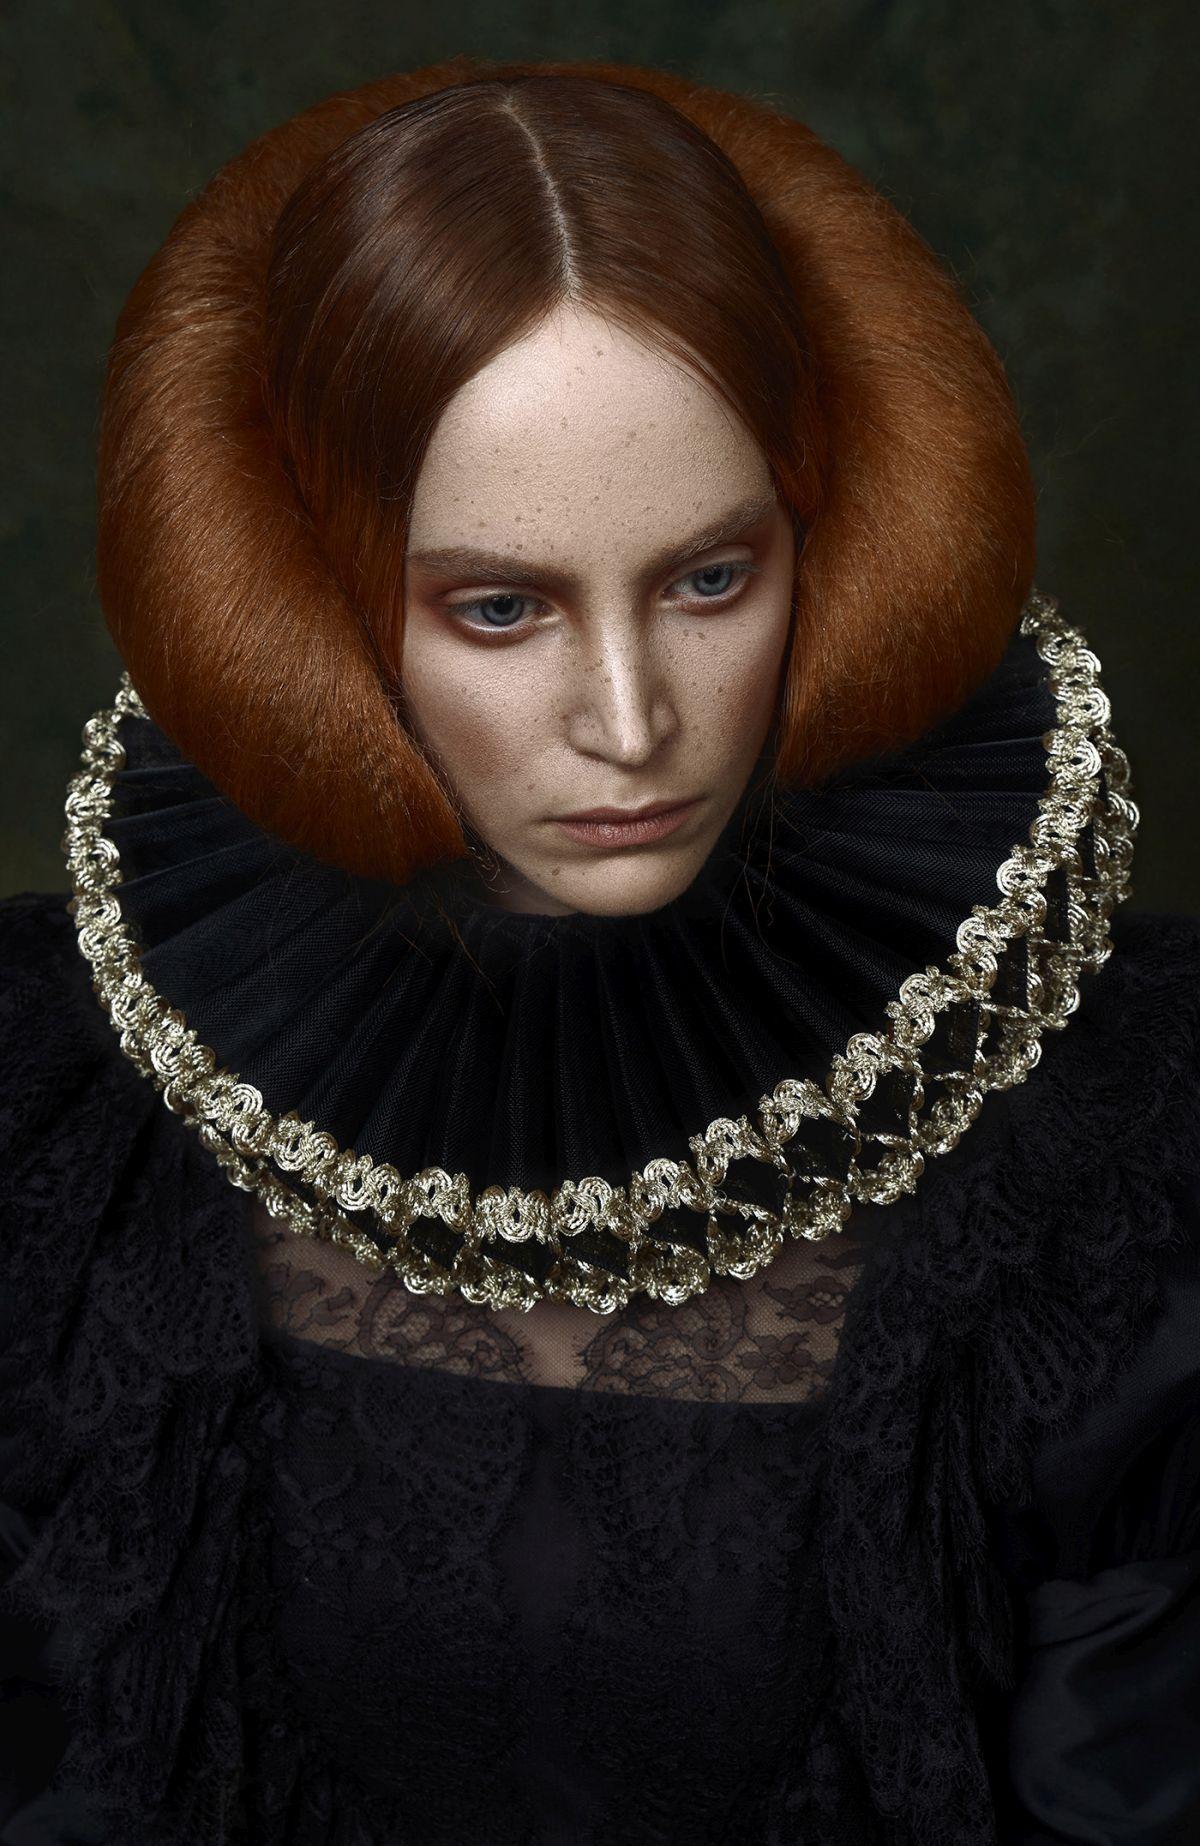 portrait photography history by peyman naderi